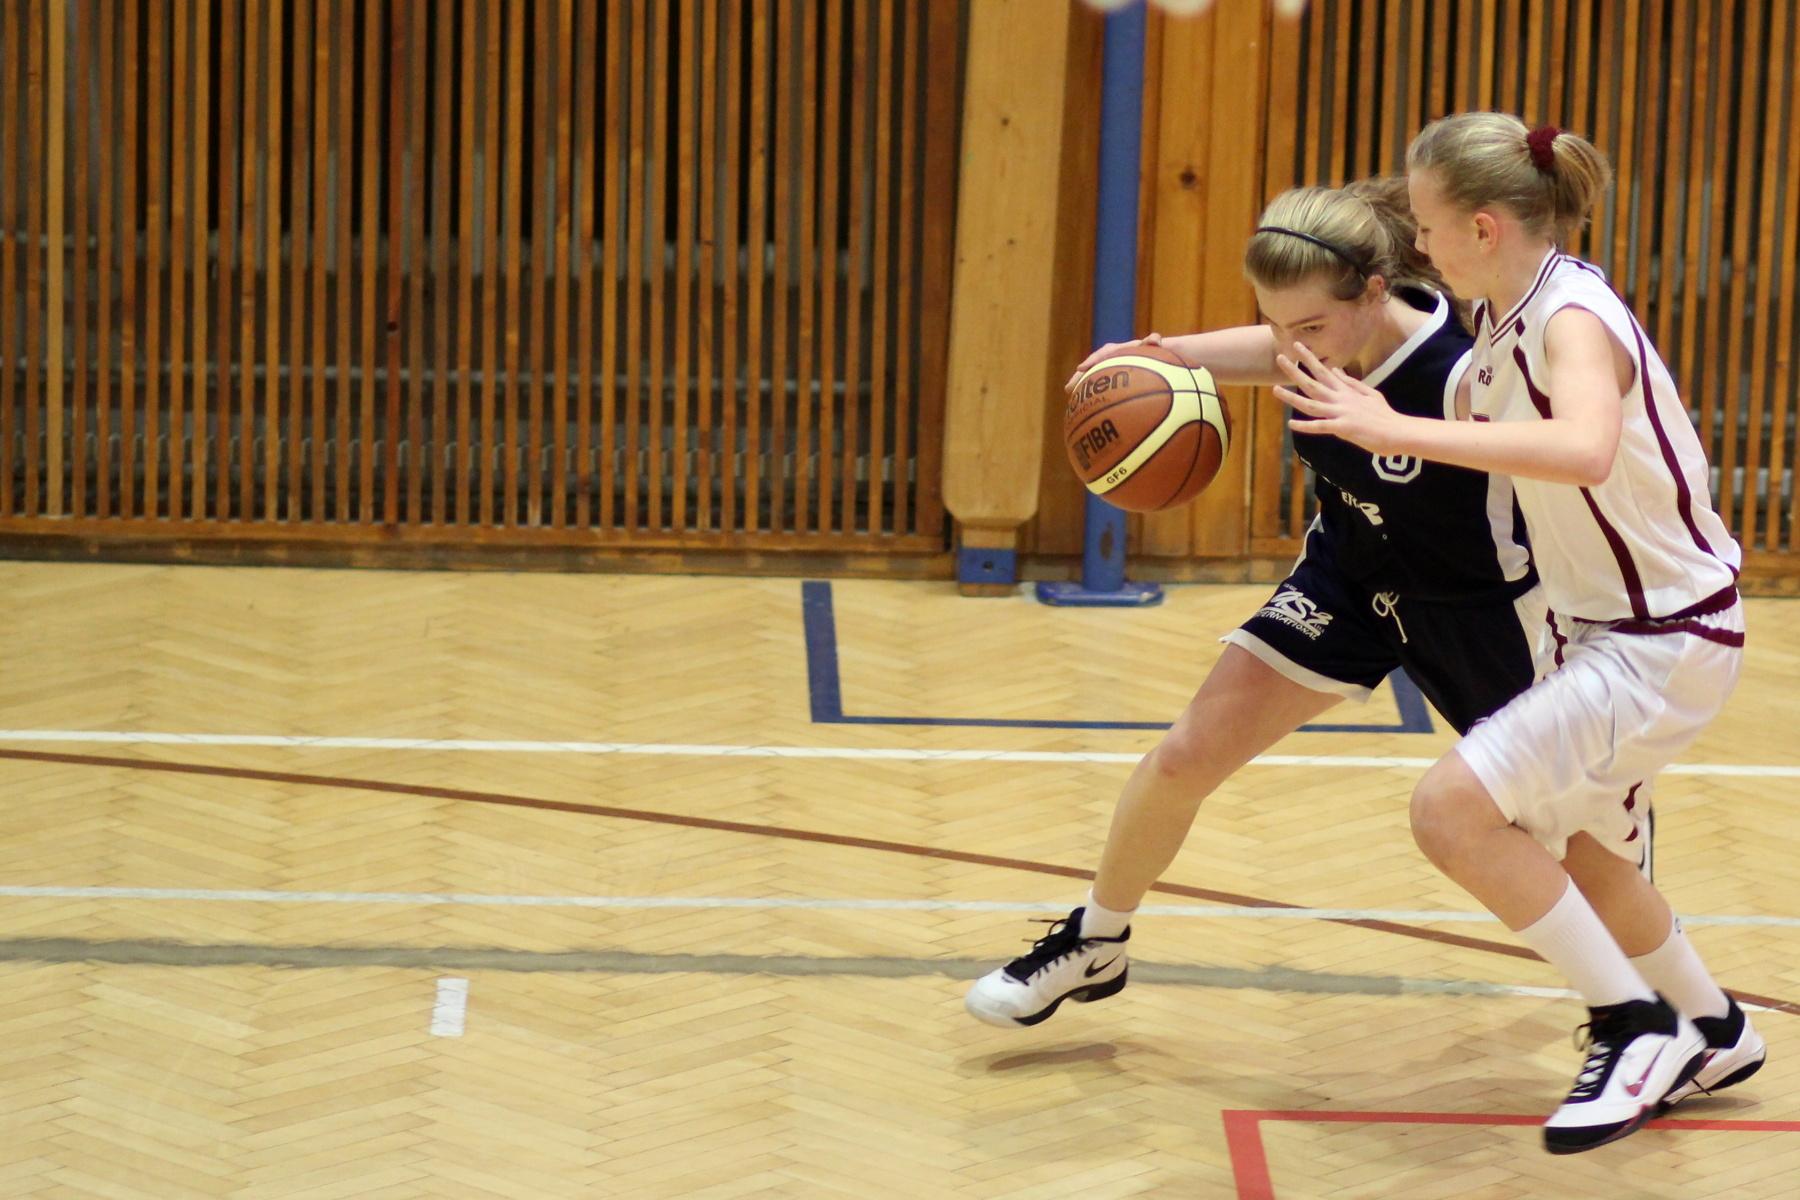 bk-zvolen-bk-petrzalka-ziacky-basketbal-11